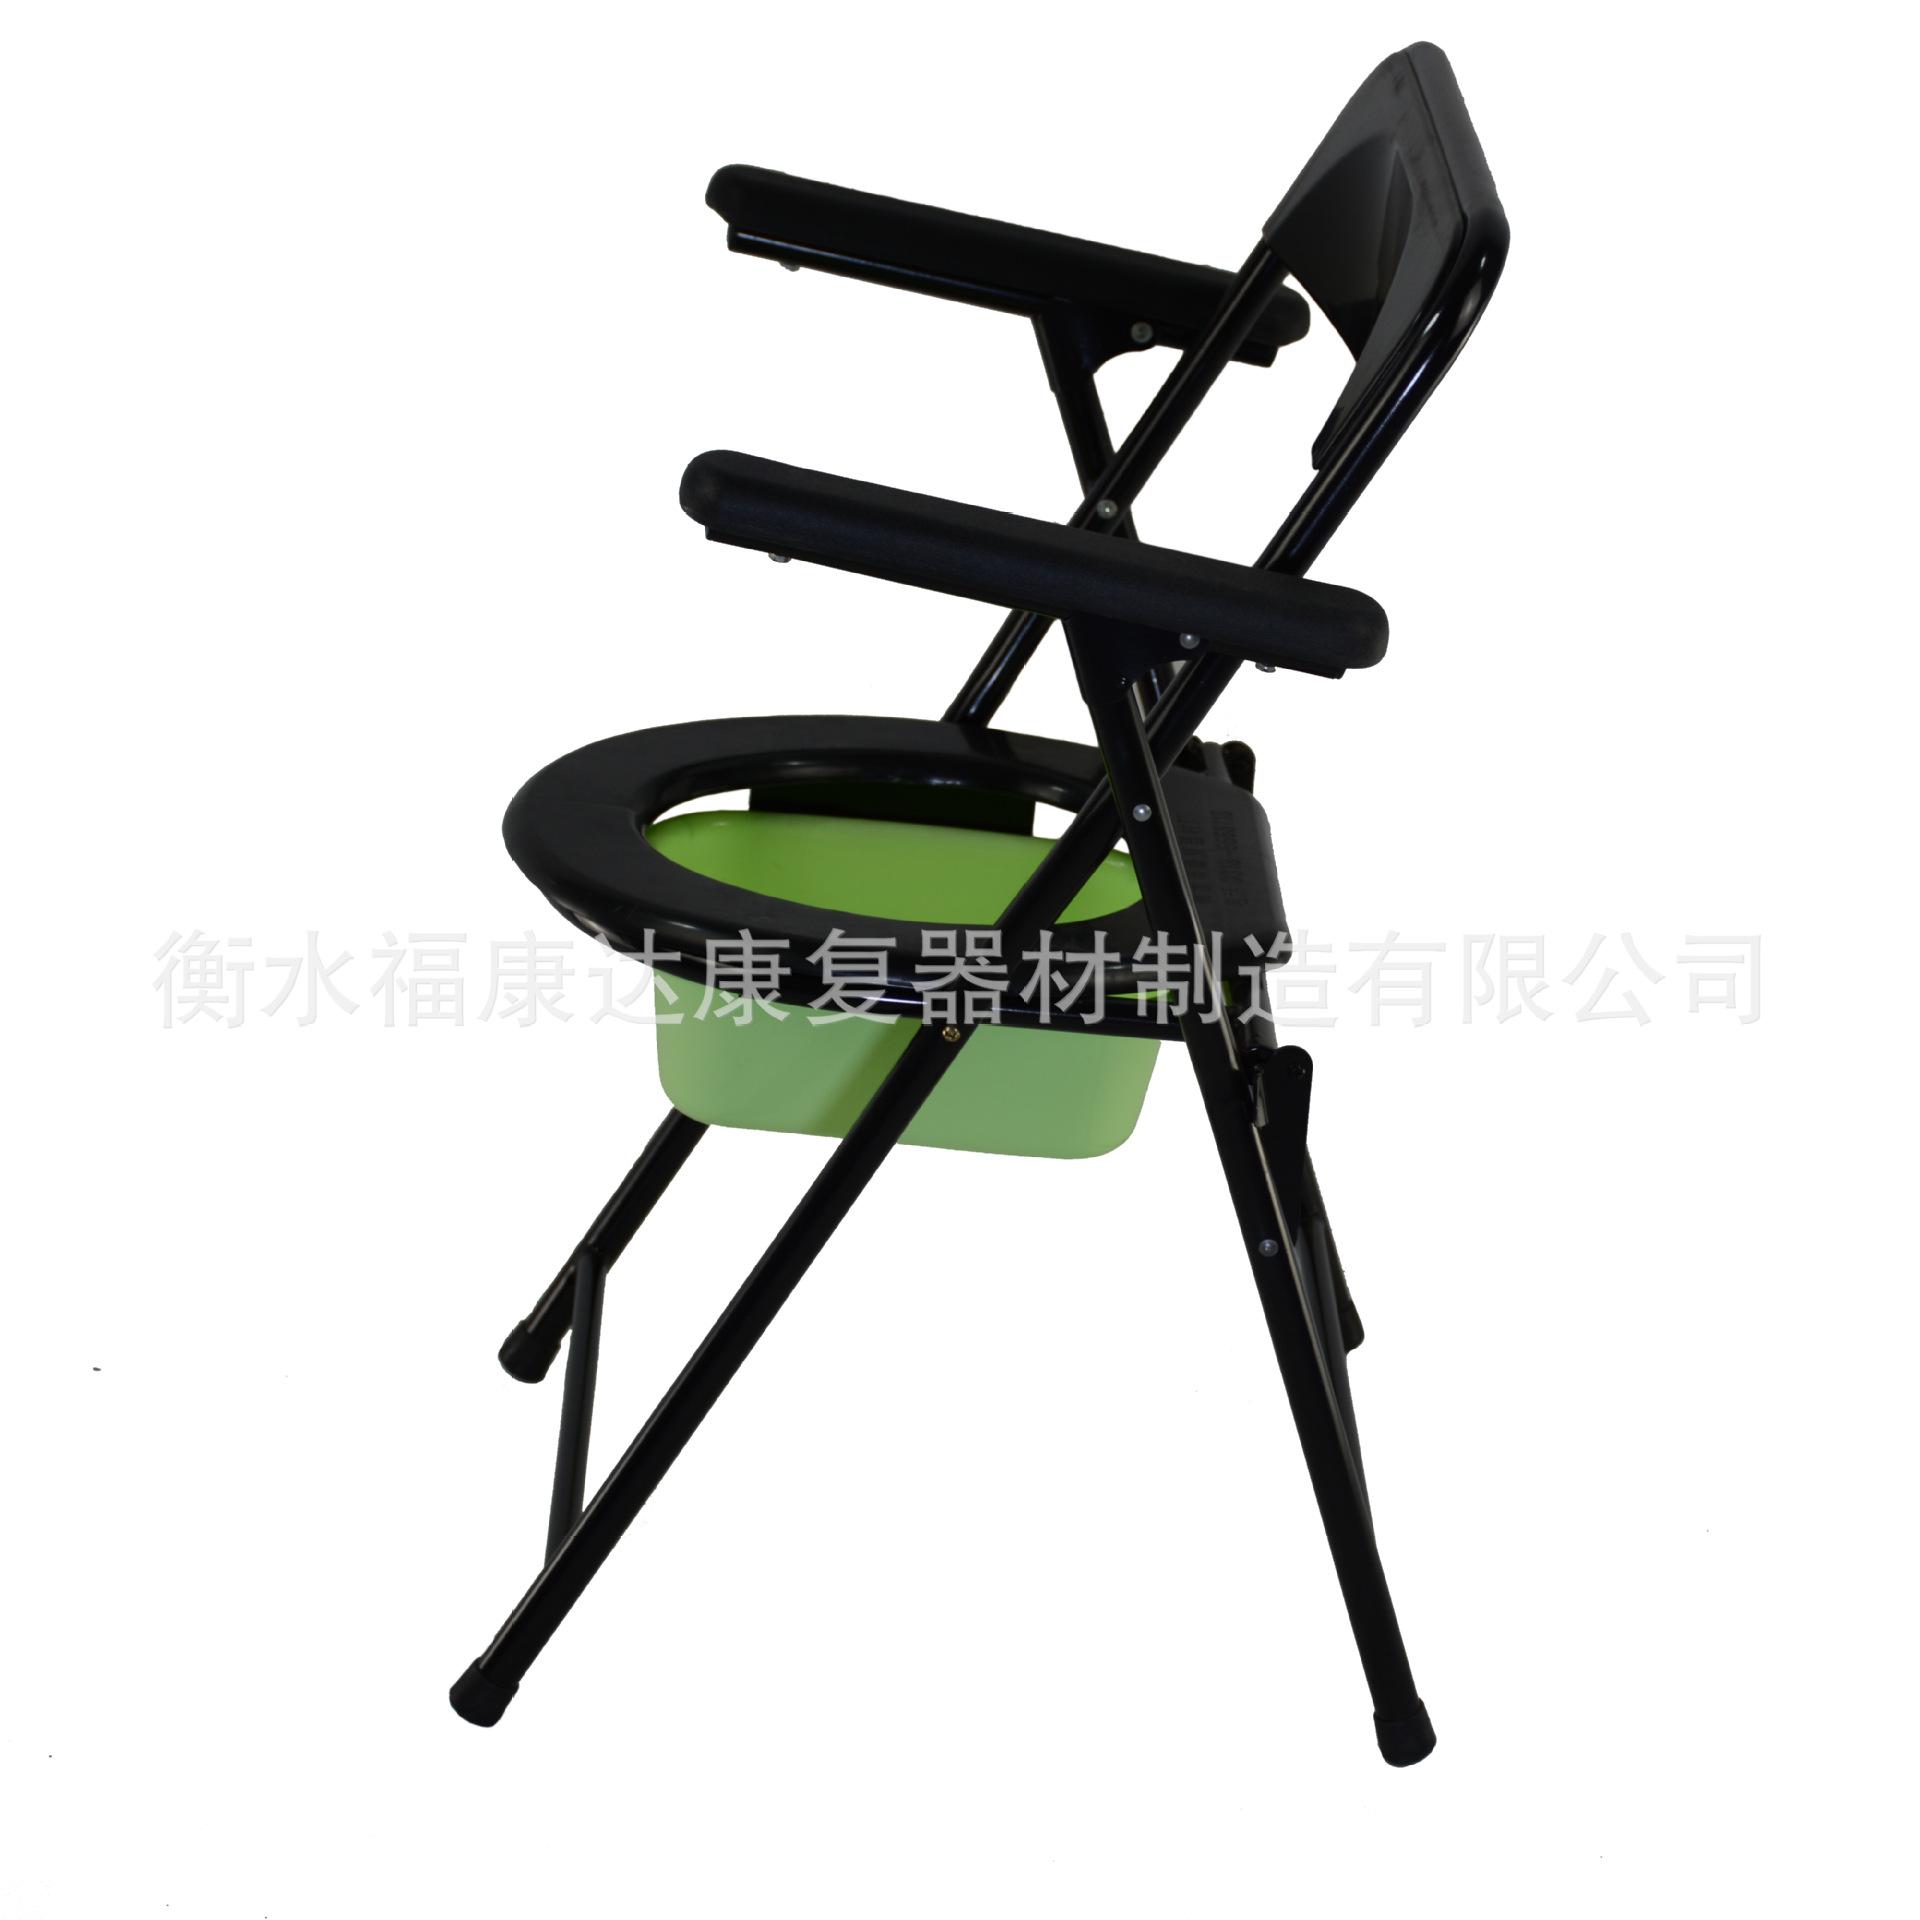 YD-FJ-B79喷塑折叠扶手靠背坐便椅.jpg